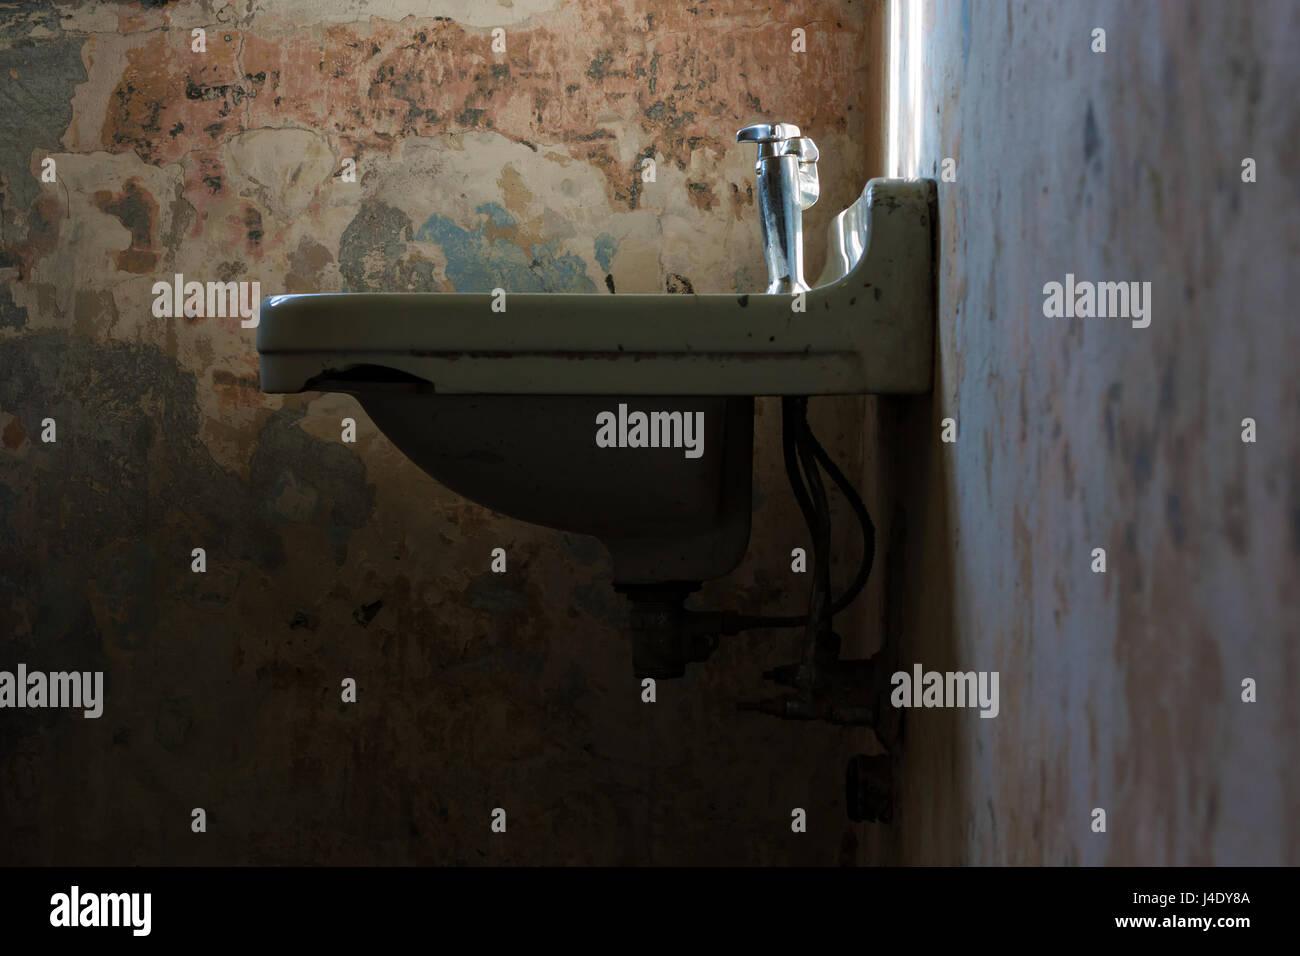 Dirty, old, weathered bathroom sink. - Stock Image